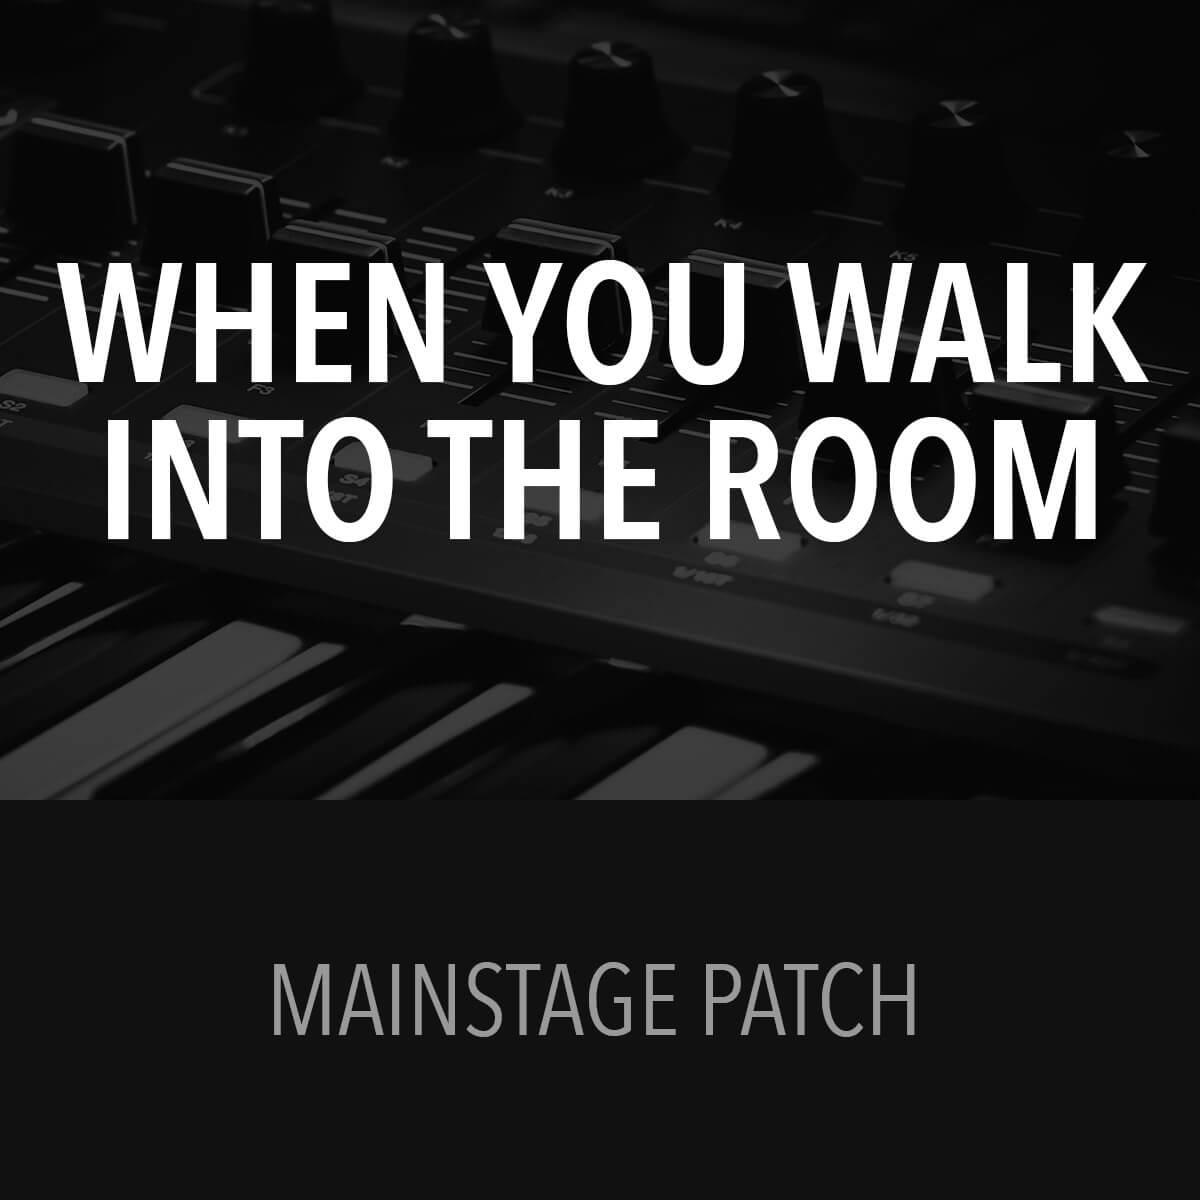 MainStage Patch - When You Walk Into the Room - Bryan & Katie Torwalt